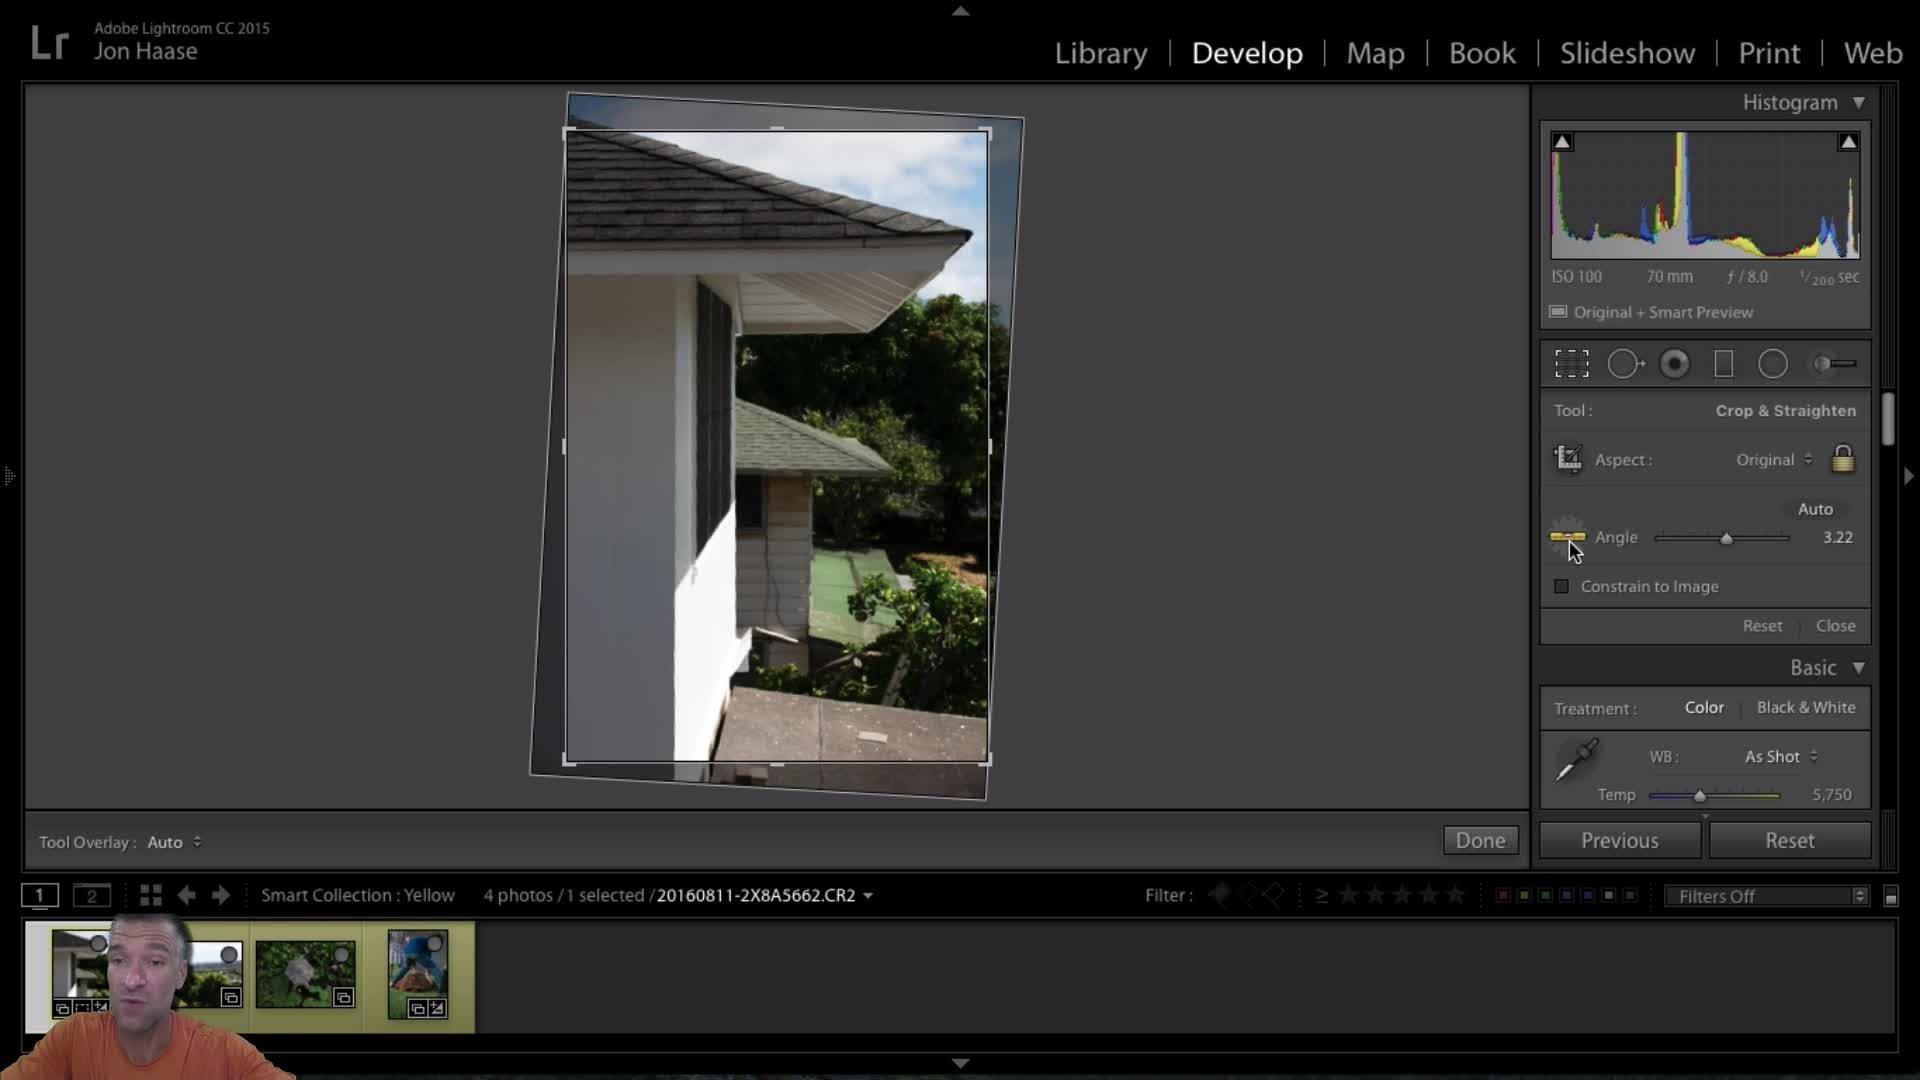 Adobe Lightroom CC: Complete Photo Editing Course | Phil Ebiner